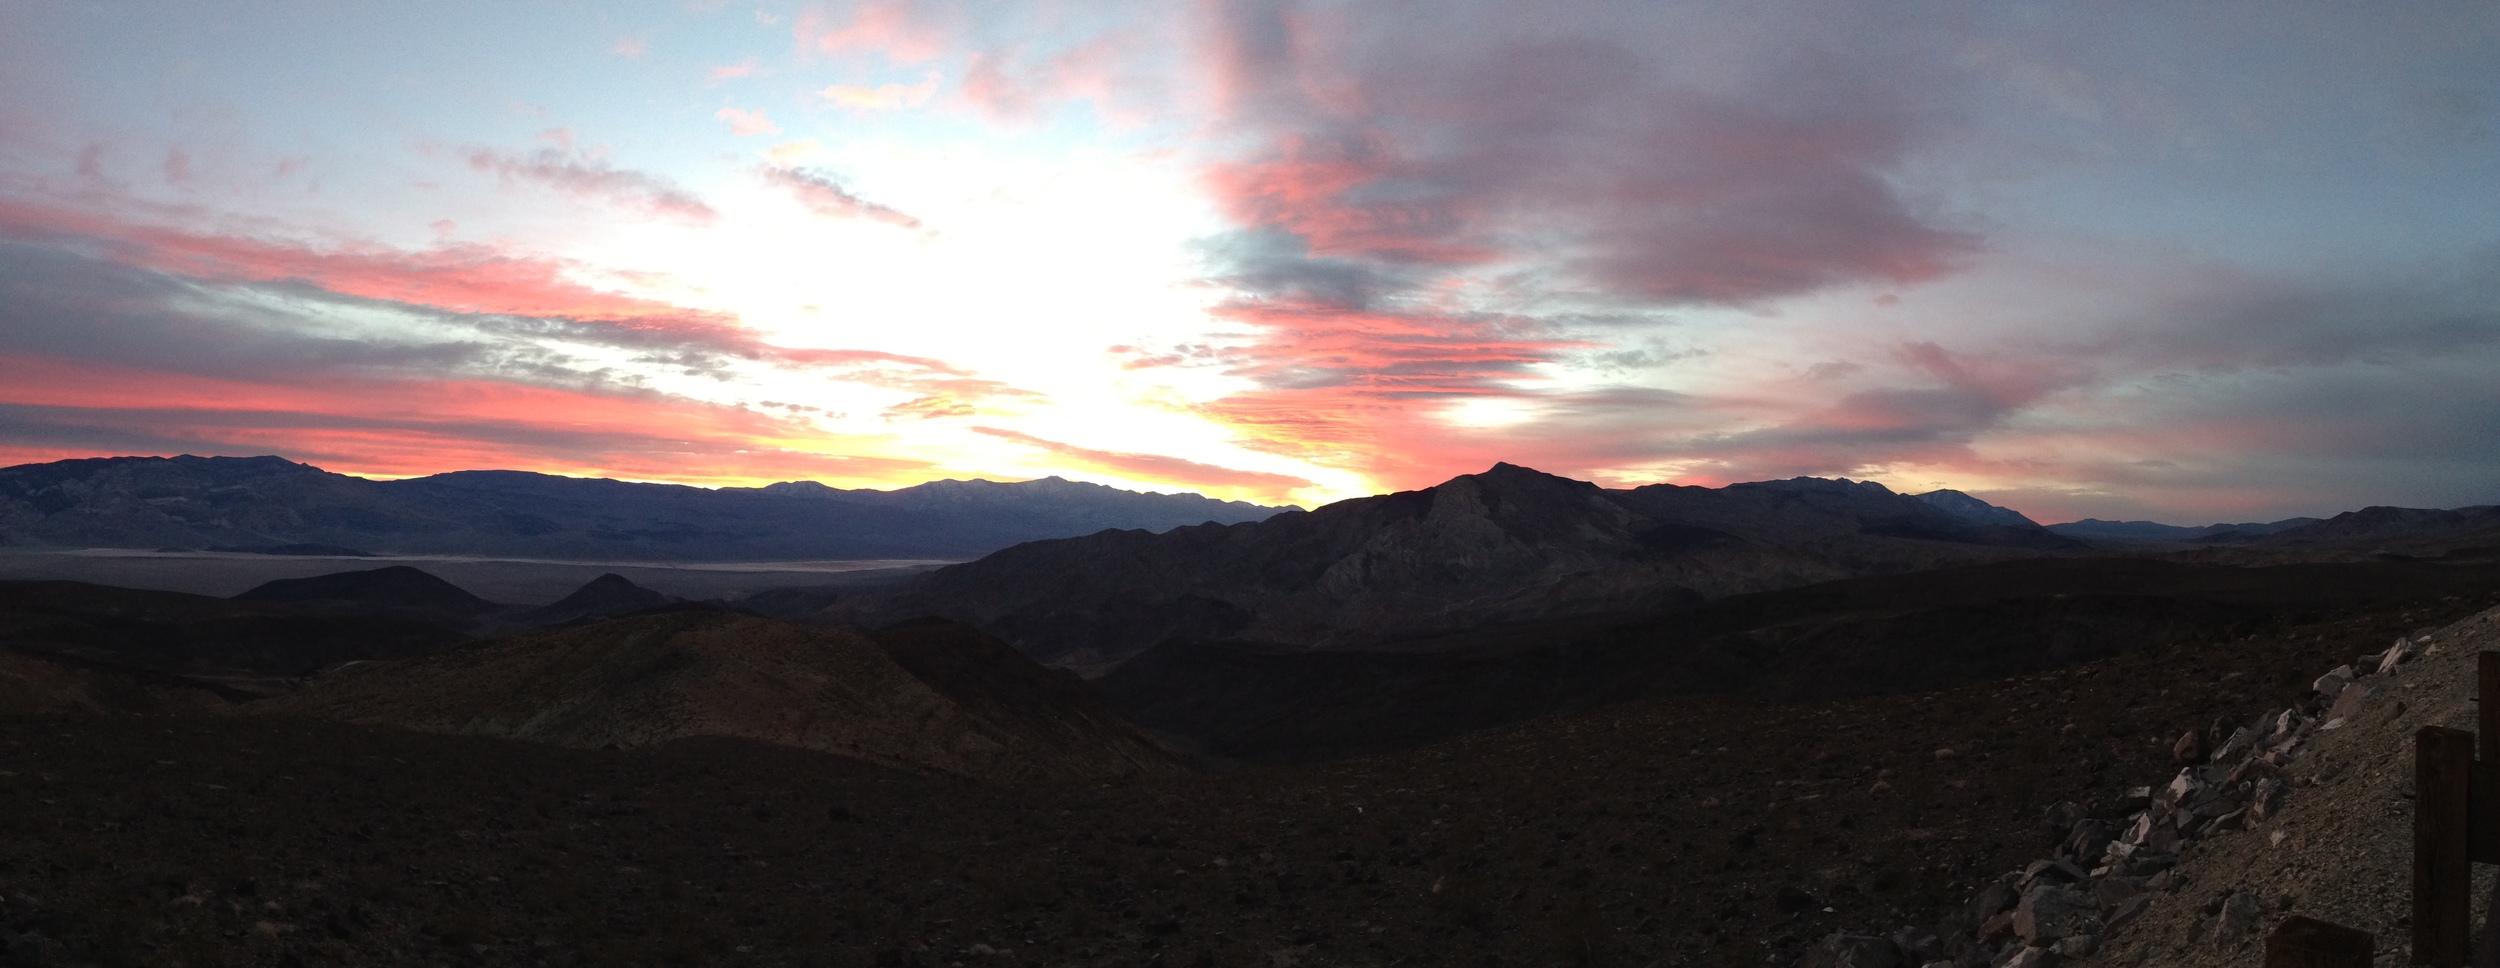 Sunrise, Father Crowley Vista, February 2, 2014